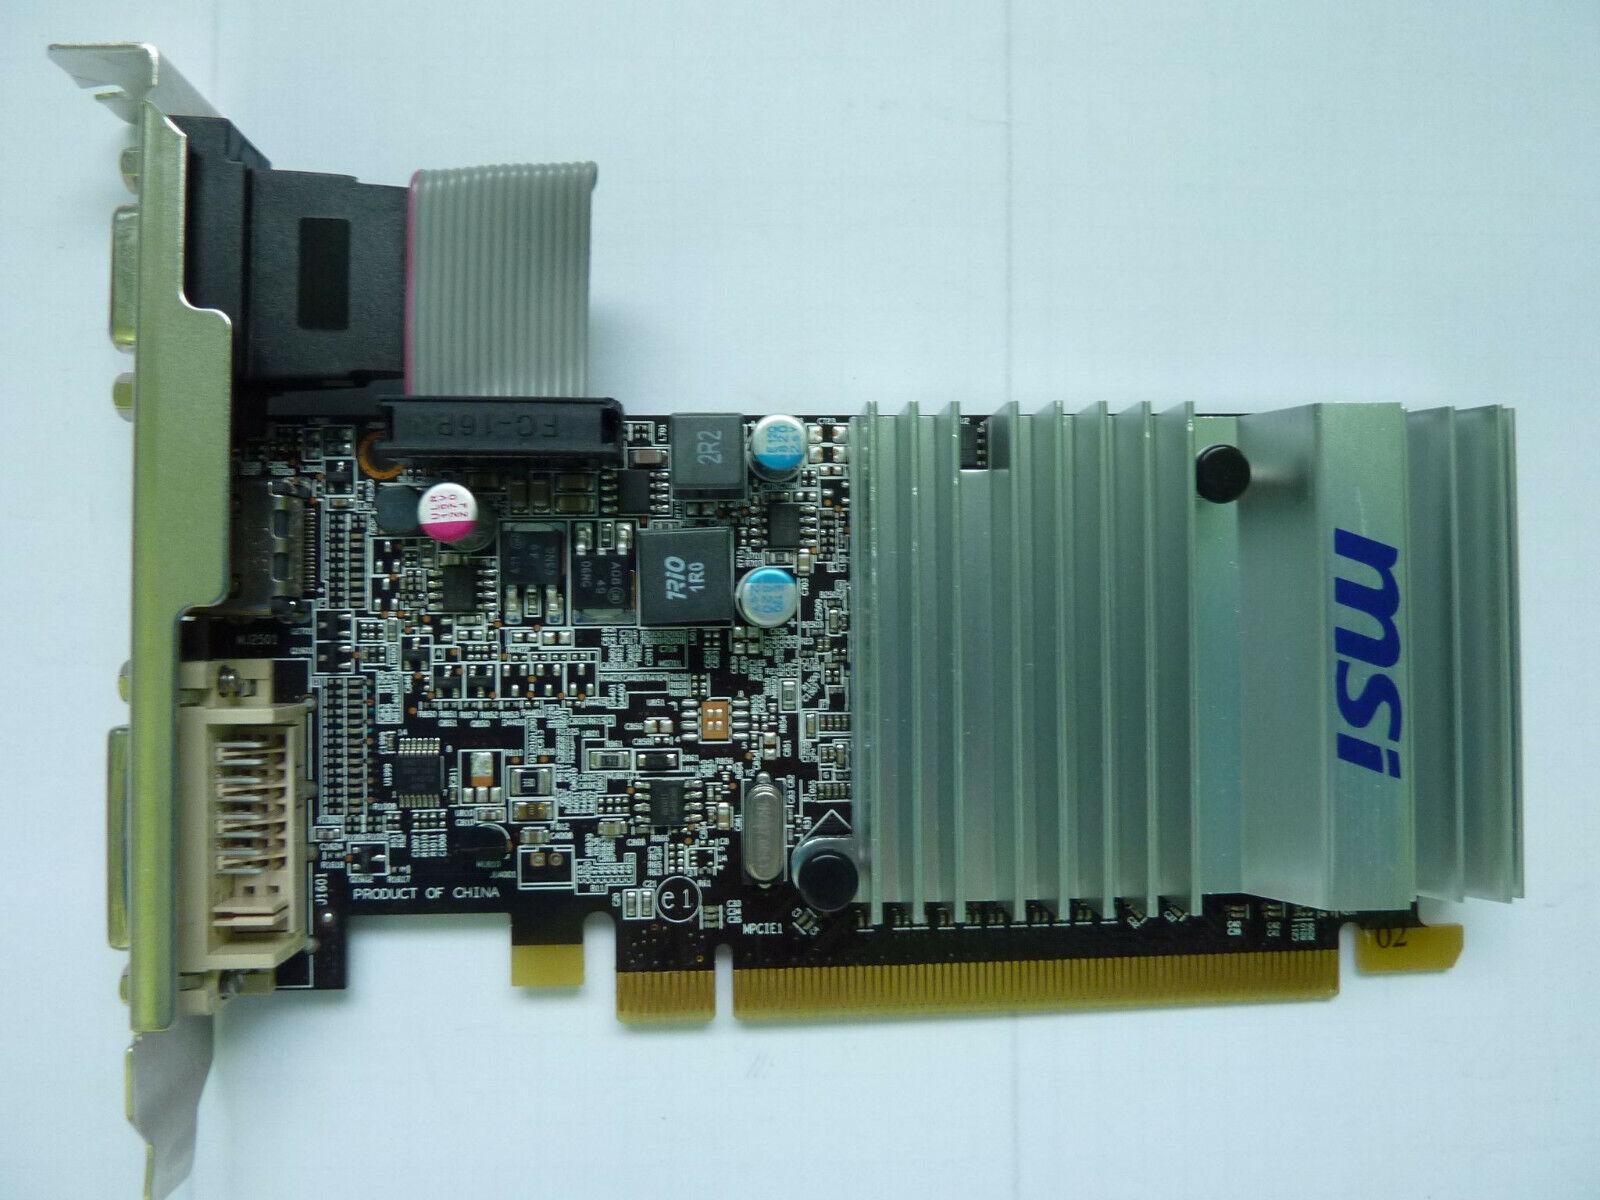 MSI ATI Radeon HD5450 Grafikkarte 512MB HDMI/DVI/D-SUB PCI-E x16 passiv gekühlt!